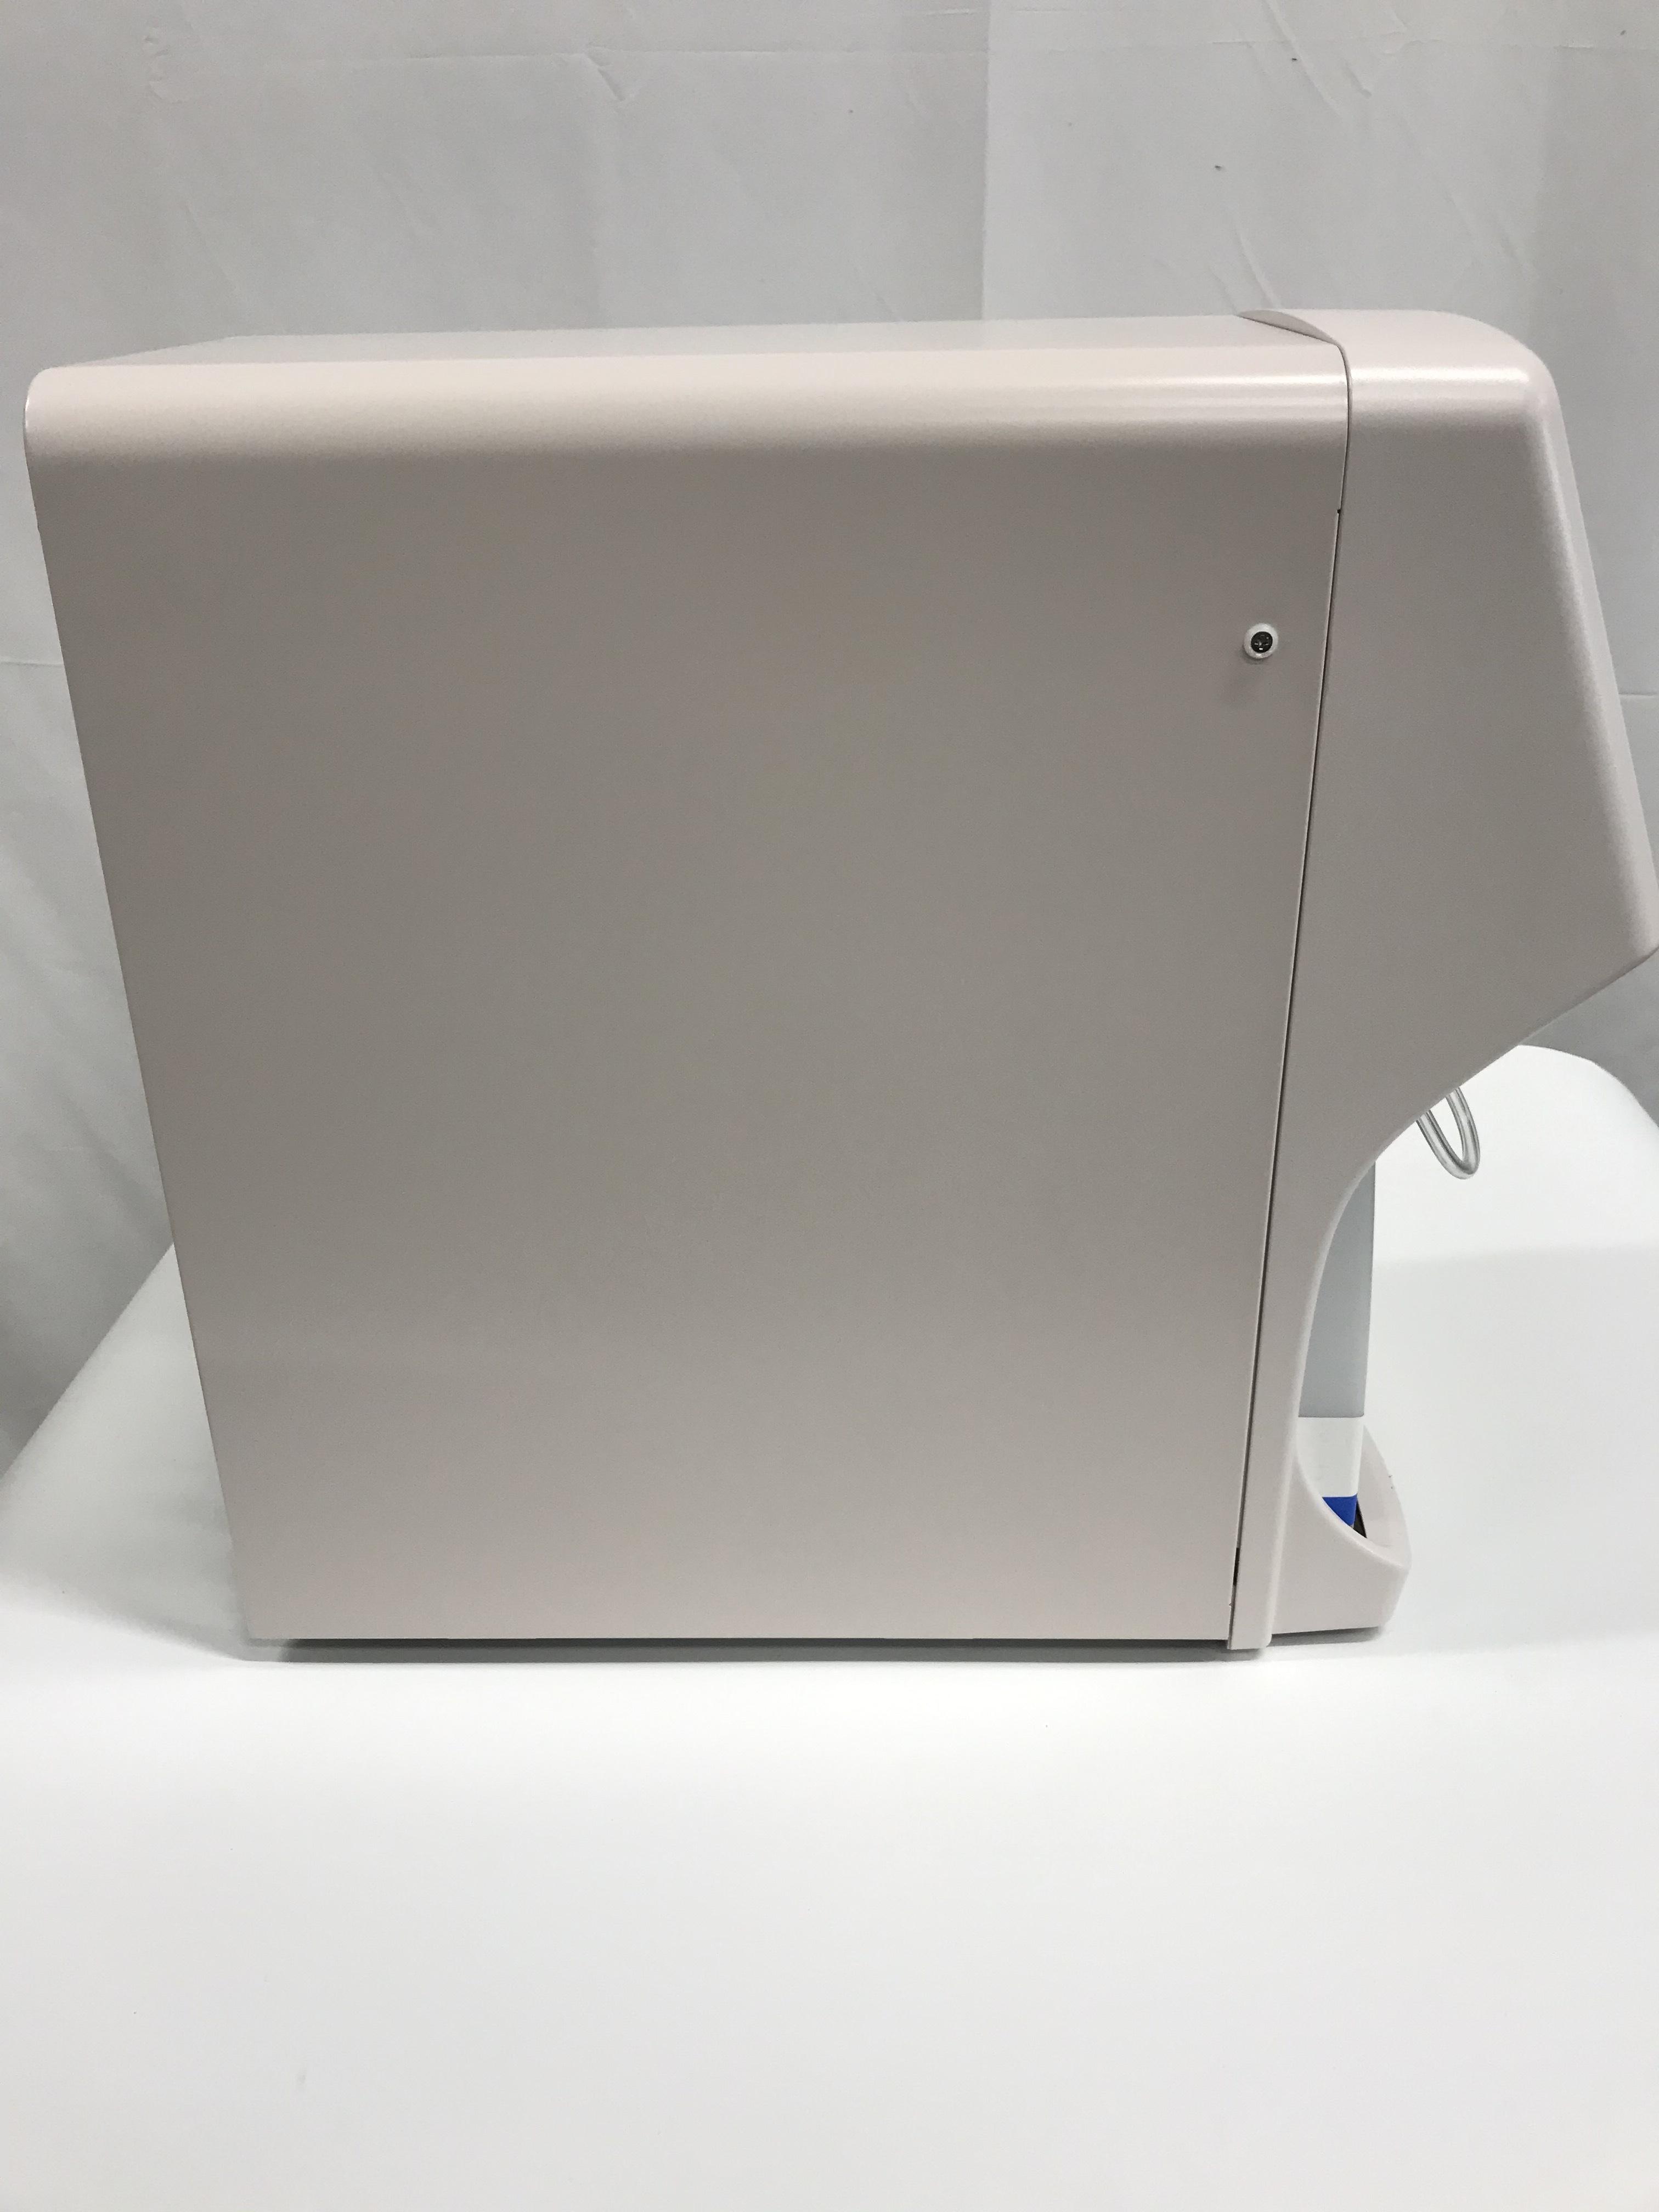 Endoscopy Room Equipment List: Product Detail|HORIBA|CRP Measuring Device|10706|Quon